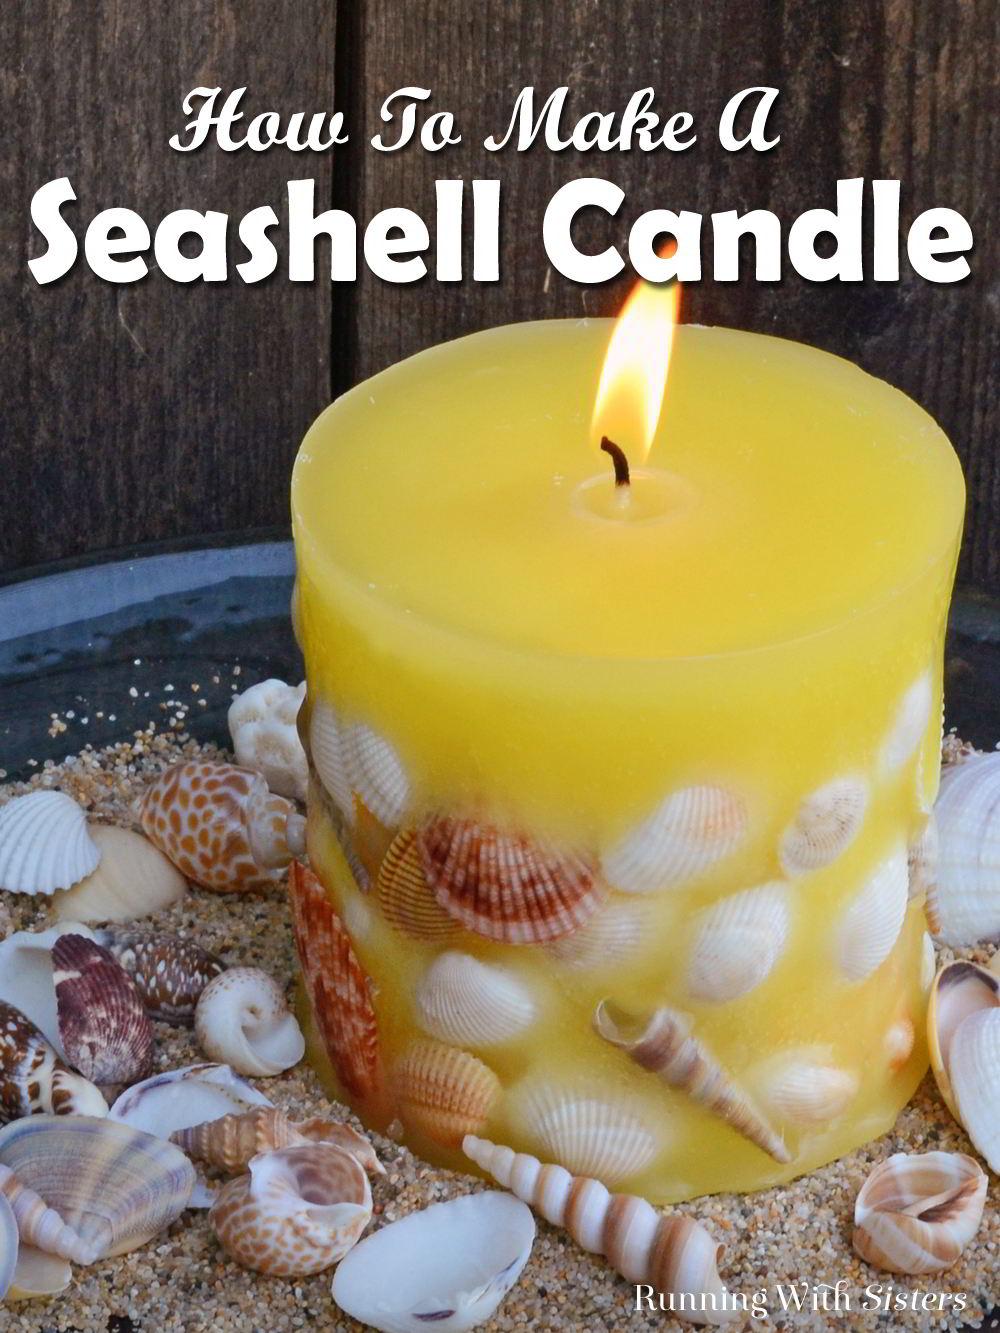 Diy Candle Making Designer Seashell Candles Running